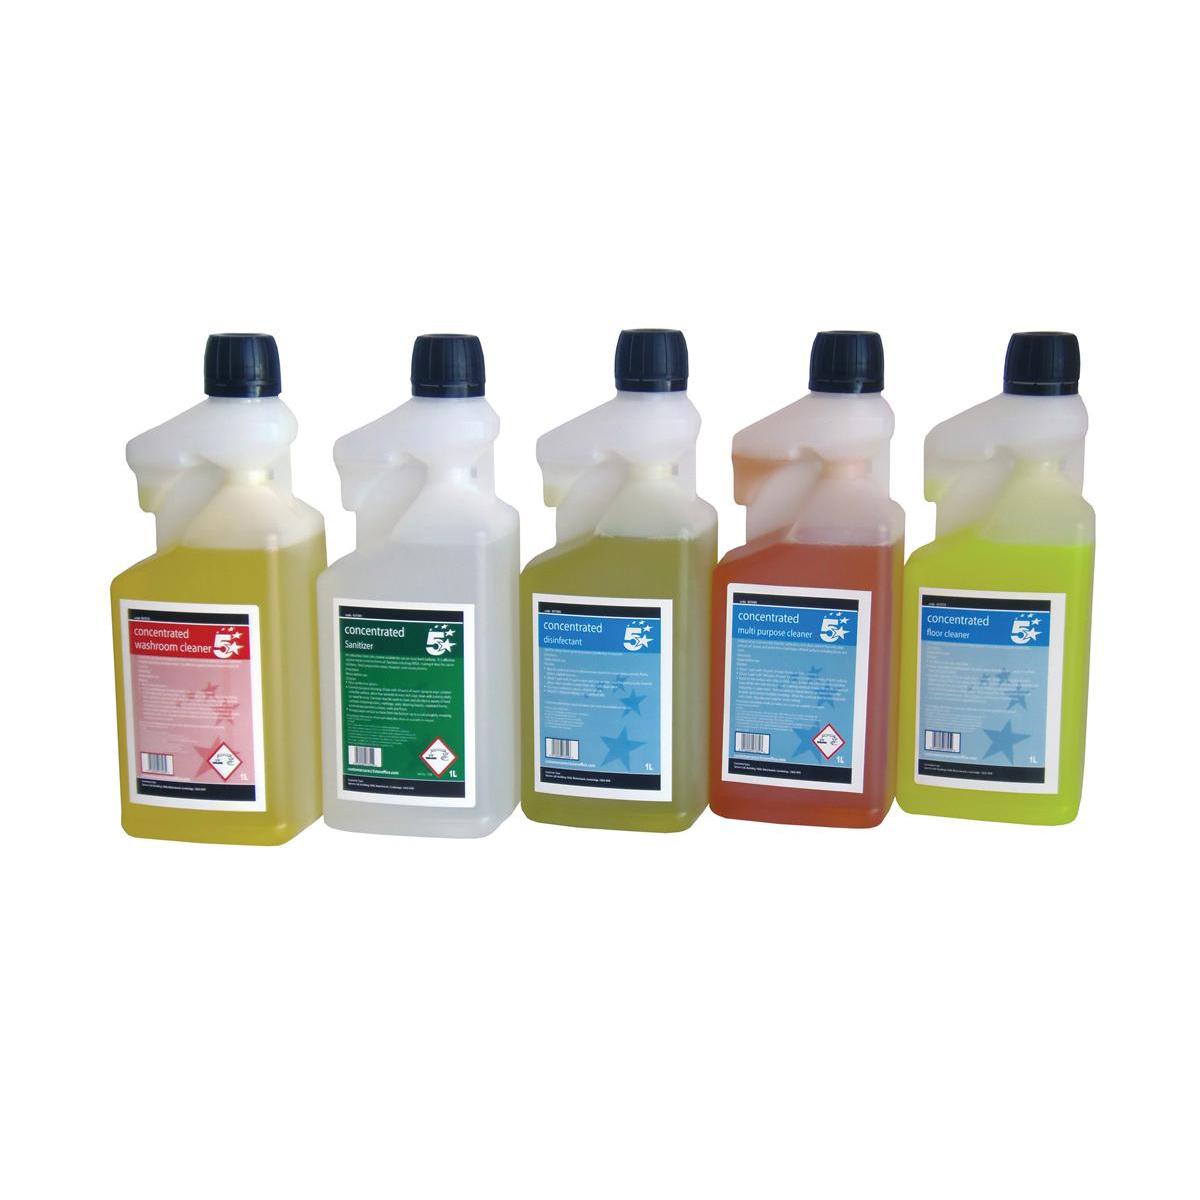 5 Star Facilities Multipurpose Cleaner & Washroom Cleaner 1 Litre [FREE 750ml Trigger Bottles]